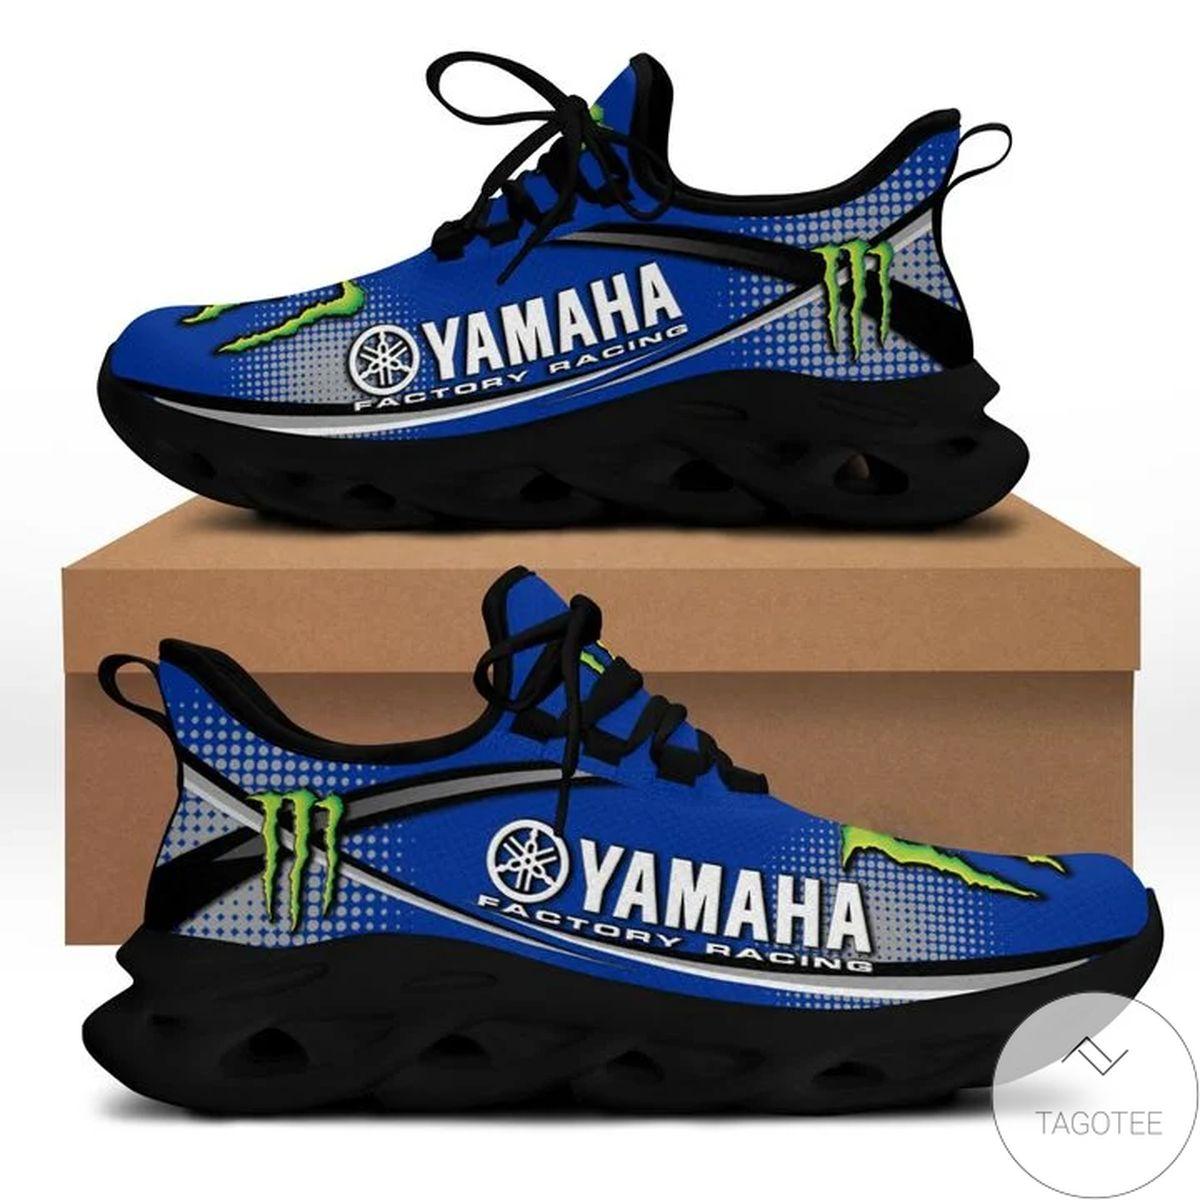 Yamaha Yeezy Running Sneaker Max Soul Shoes